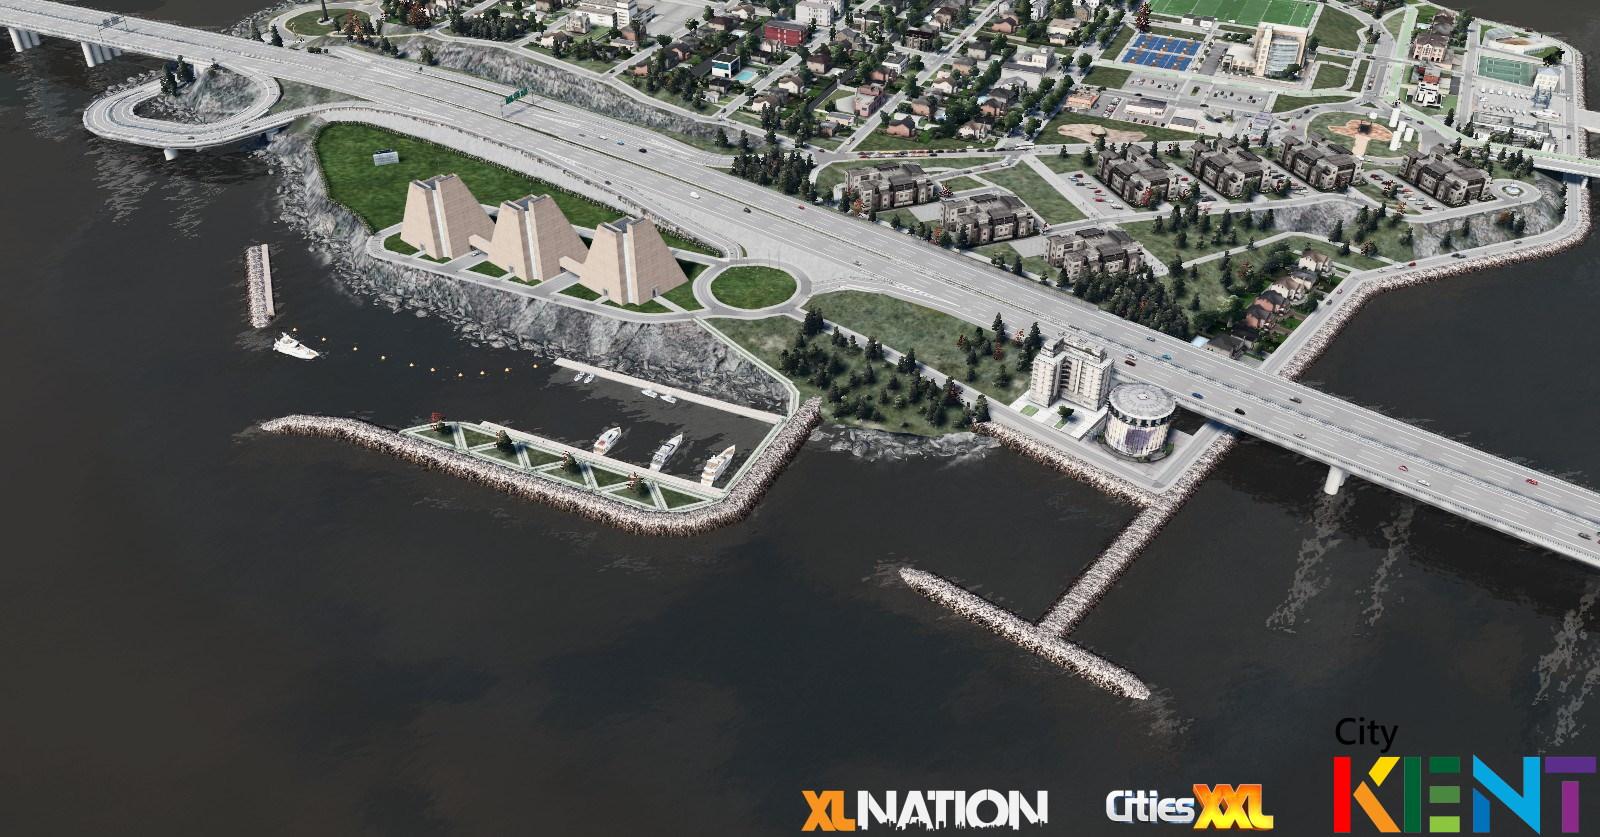 Petty Island_KENT_03_XLN_CitiesXXL.jpg